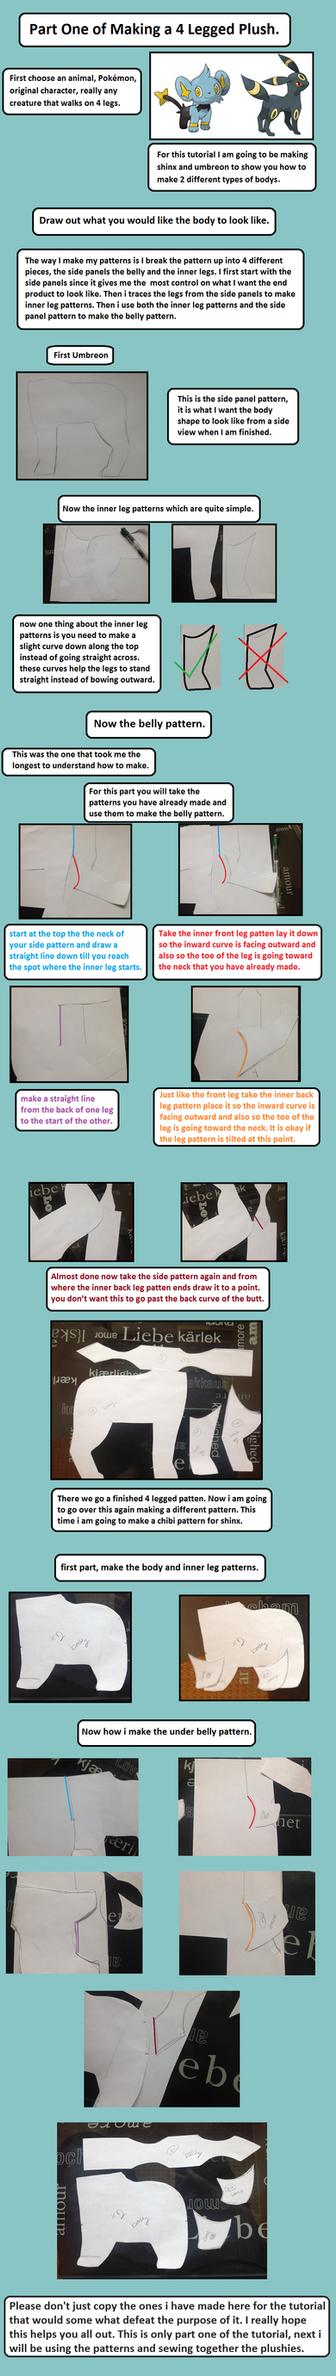 4 legged plush tutorial by Plush-Lore